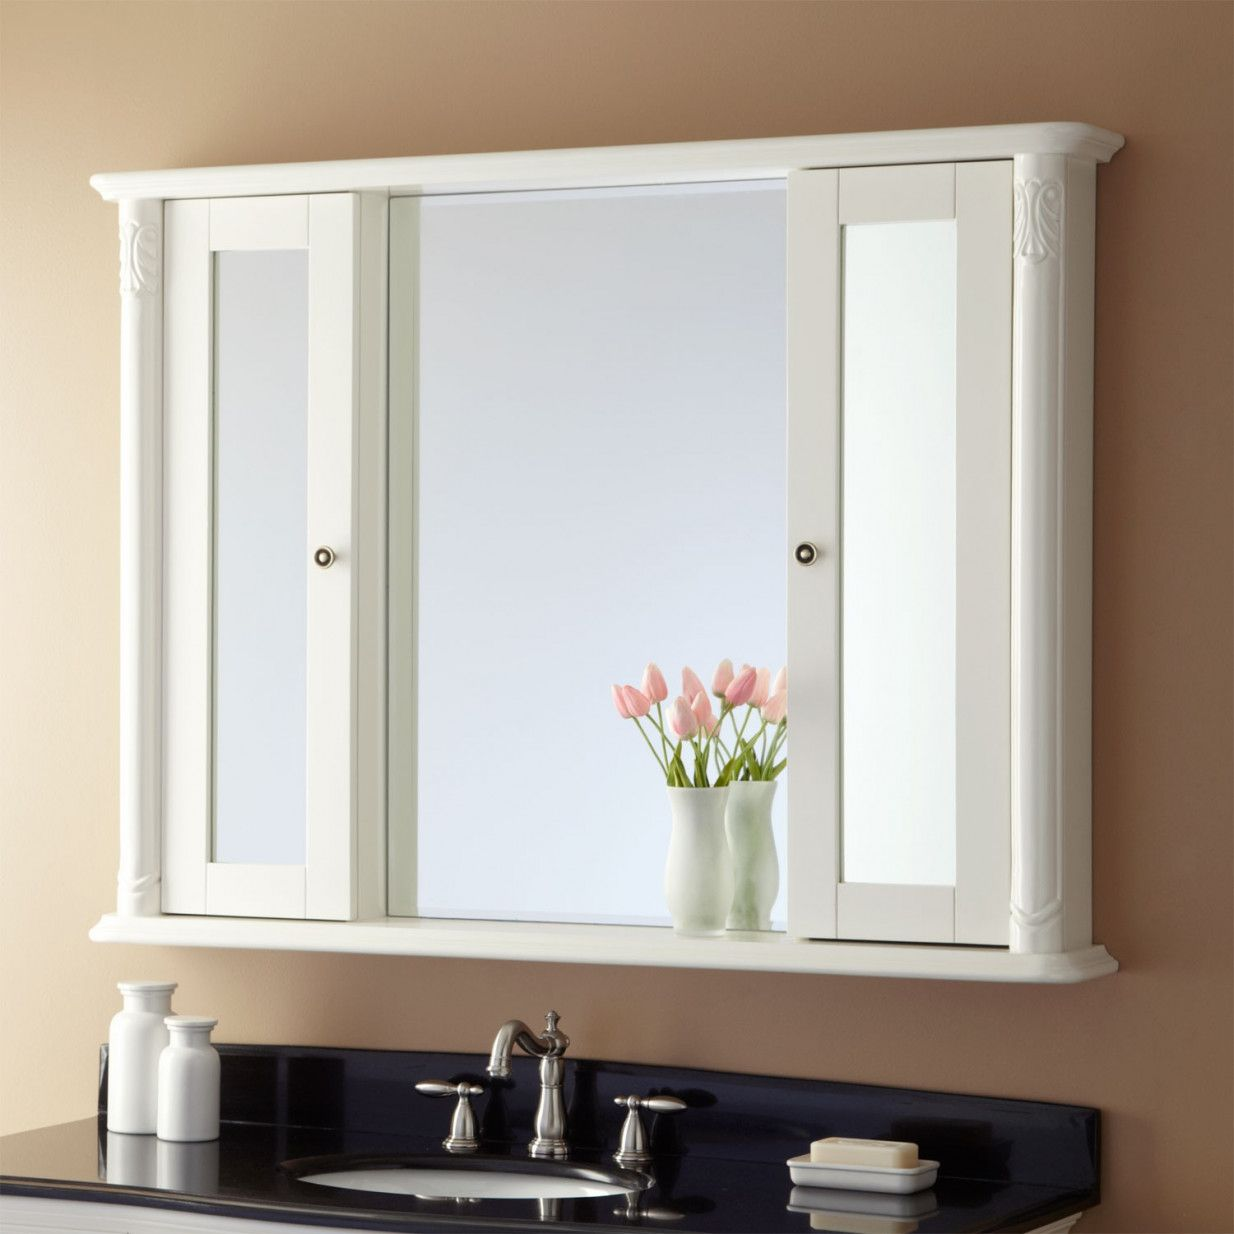 70+ Bathroom Medicine Cabinets Lowes - Best Interior Paint Brands ...